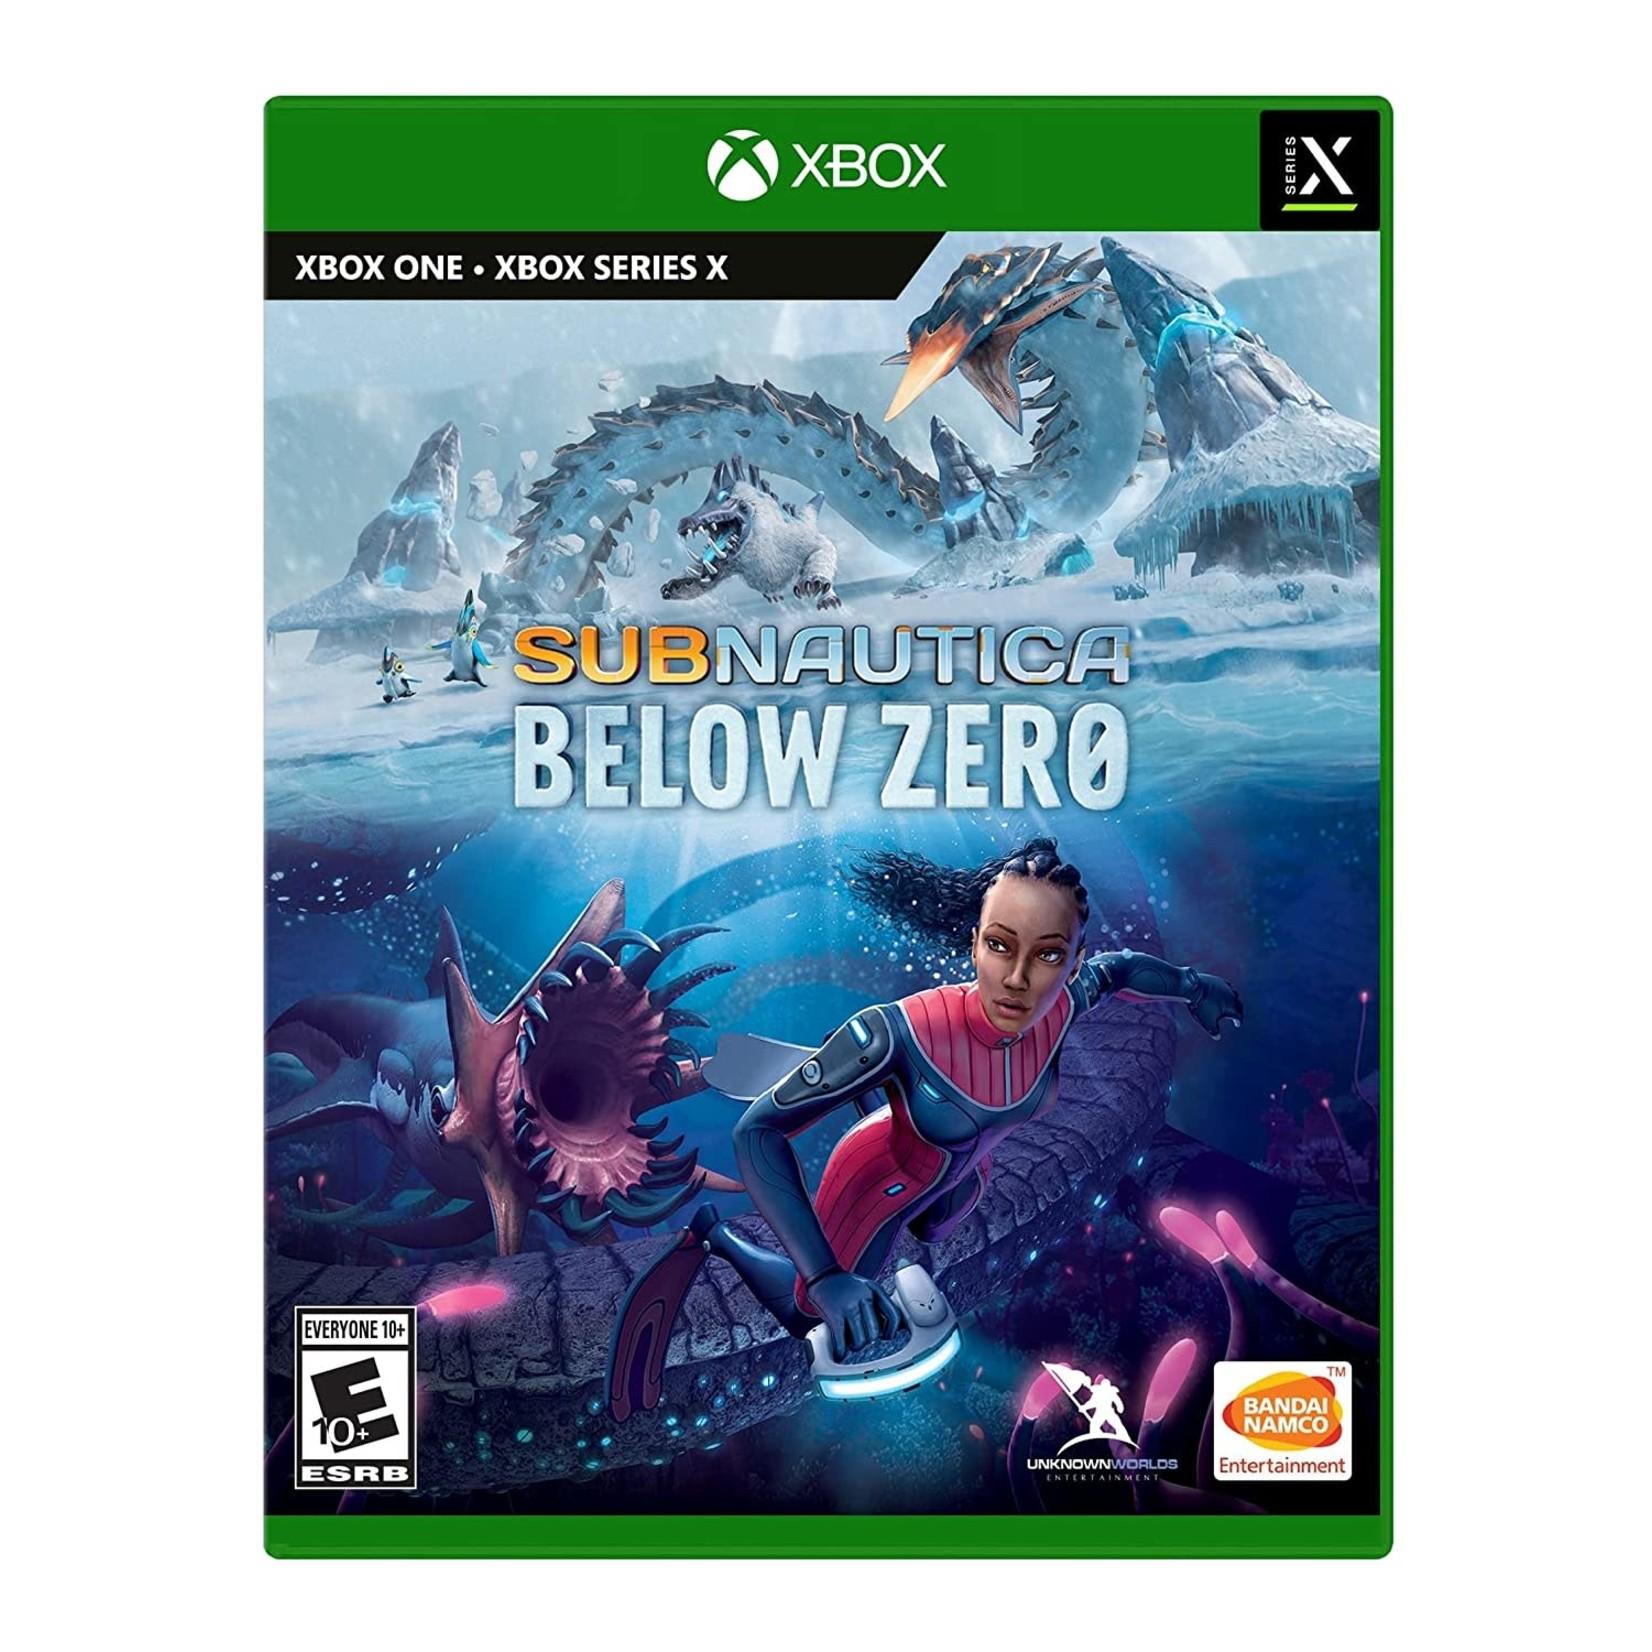 XB1-Subnautica: Below Zero